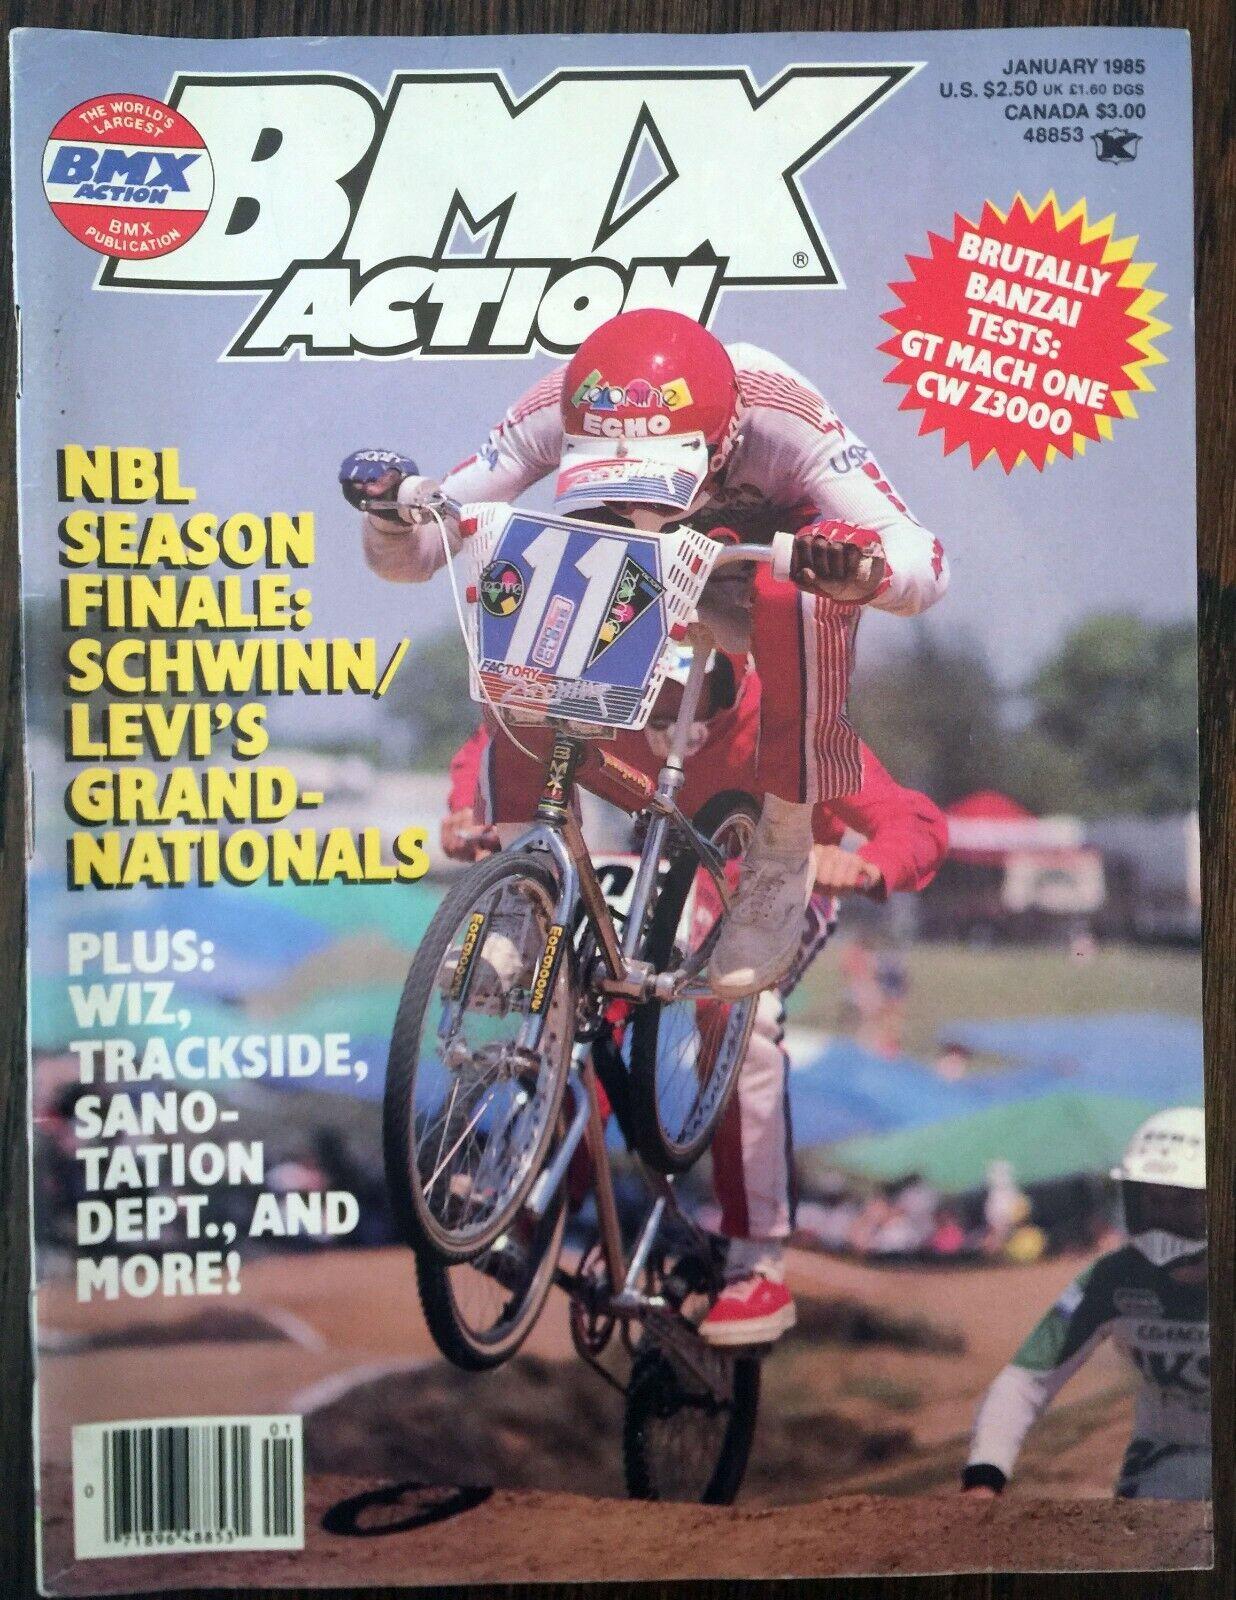 Bicycle  Motocross Action (BMXA) - January 1985  big sale